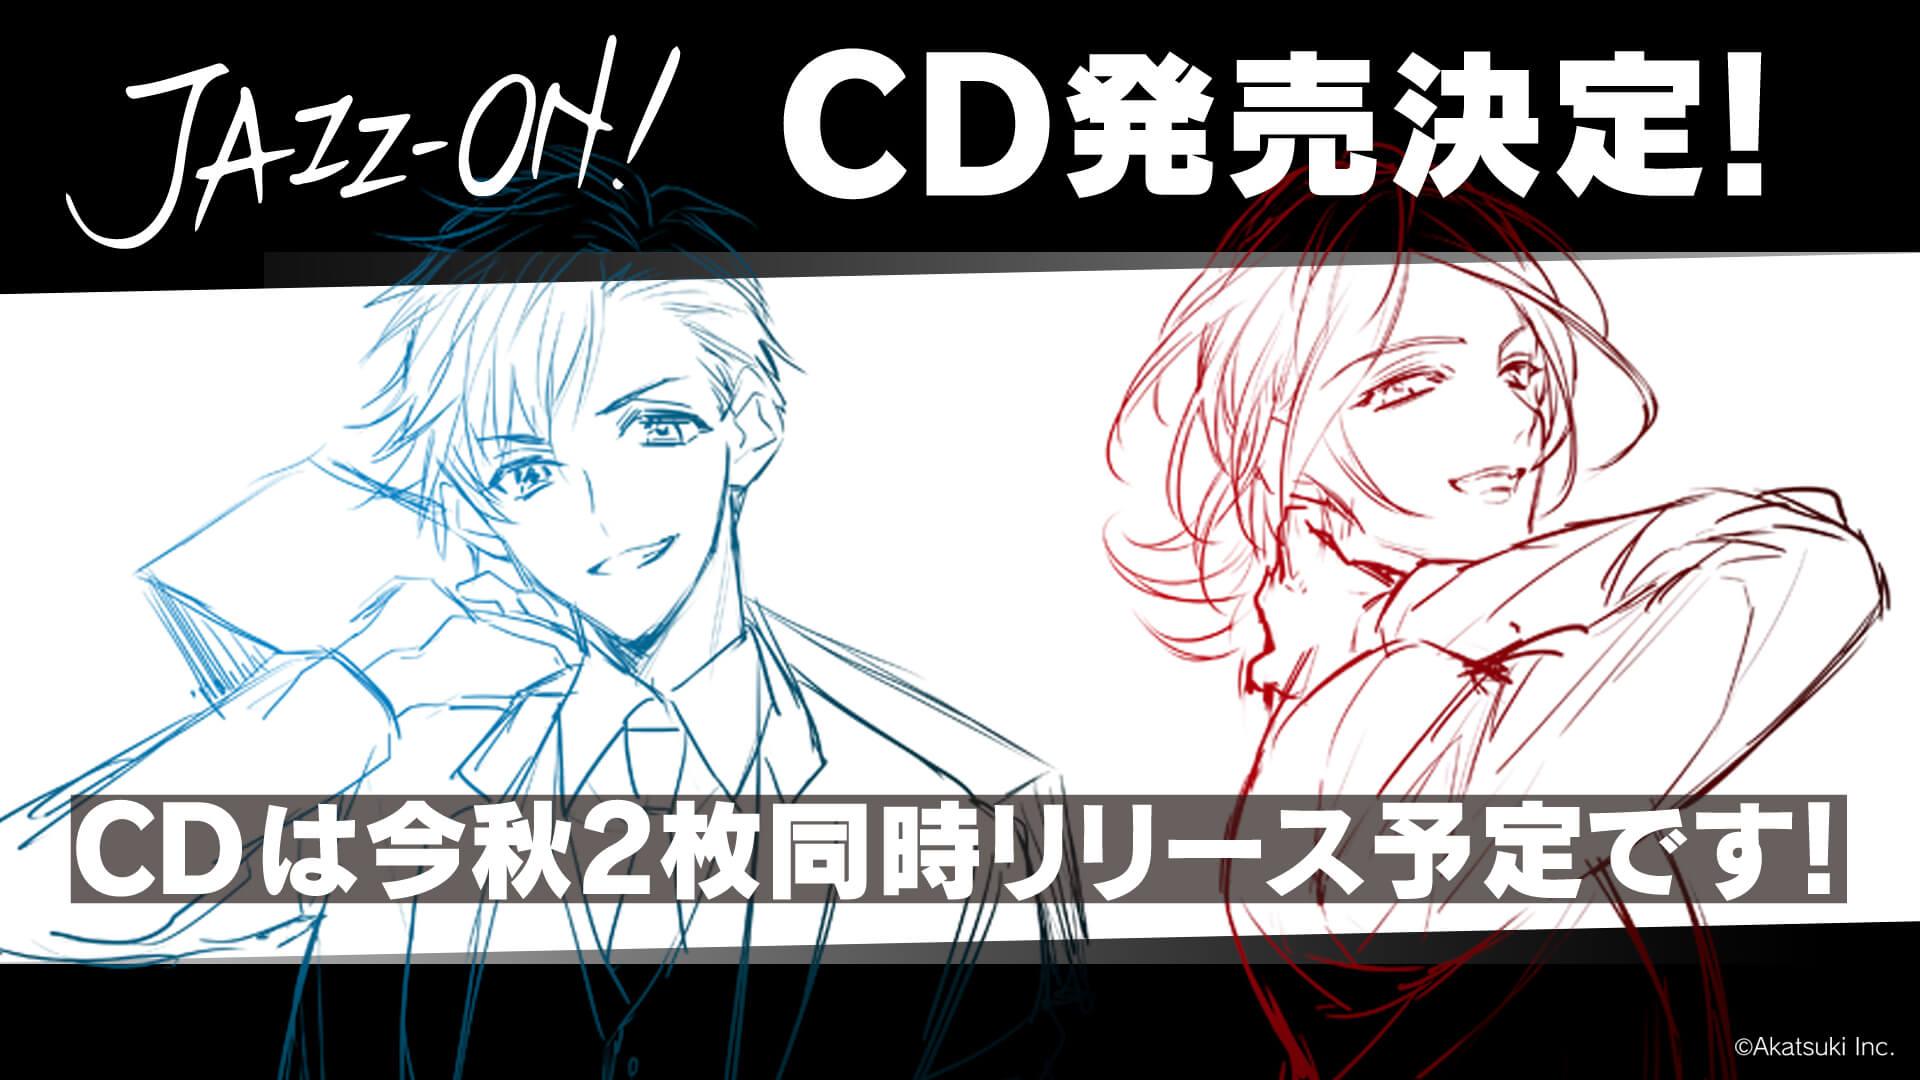 CD発売決定